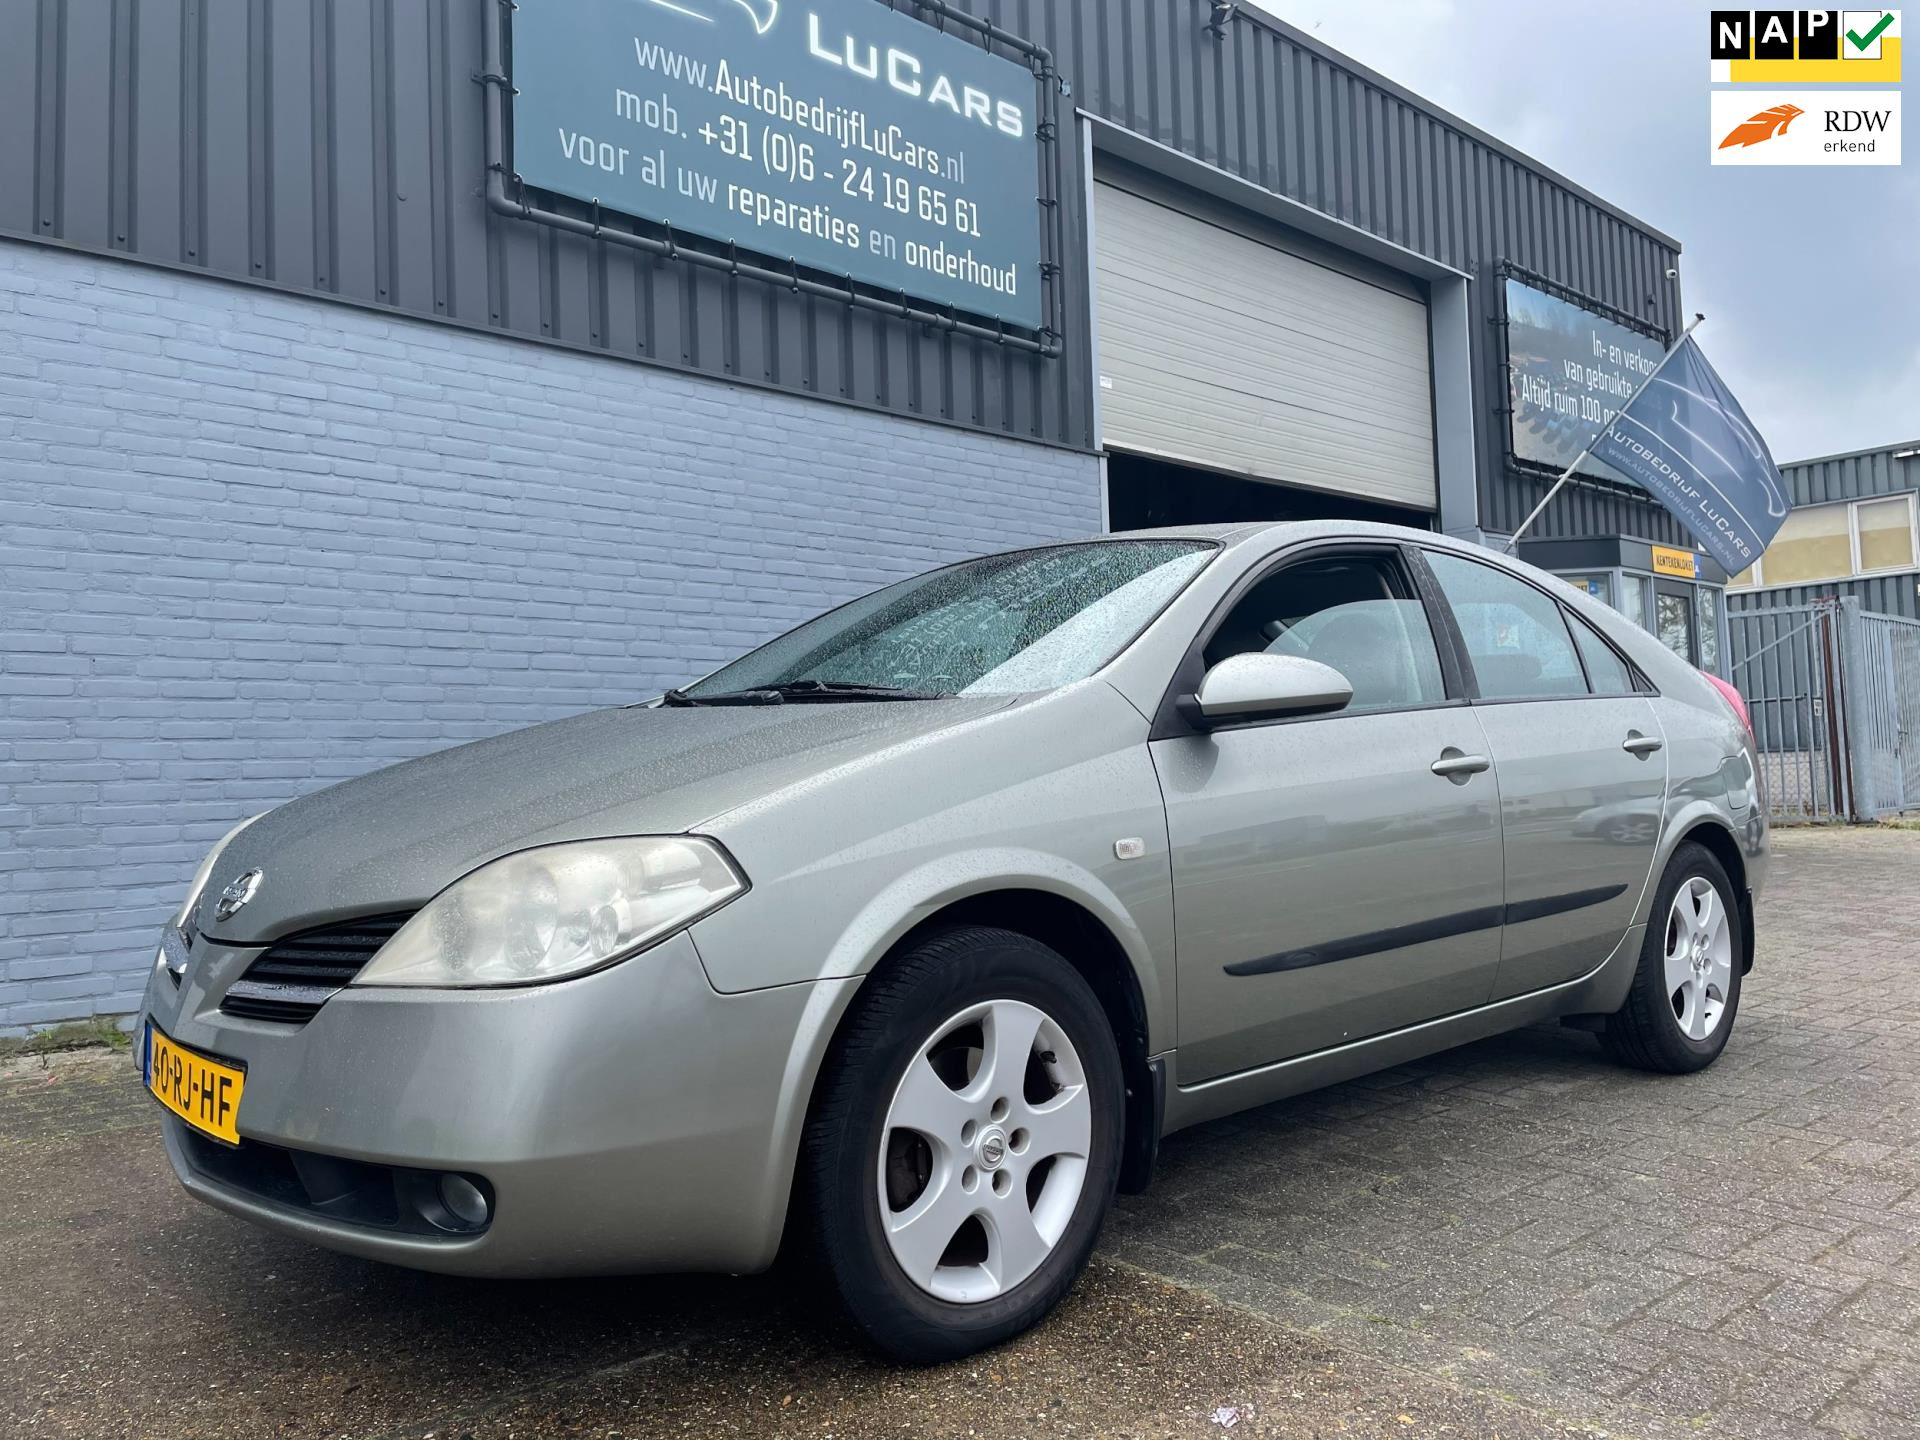 Nissan Primera occasion - LuCars